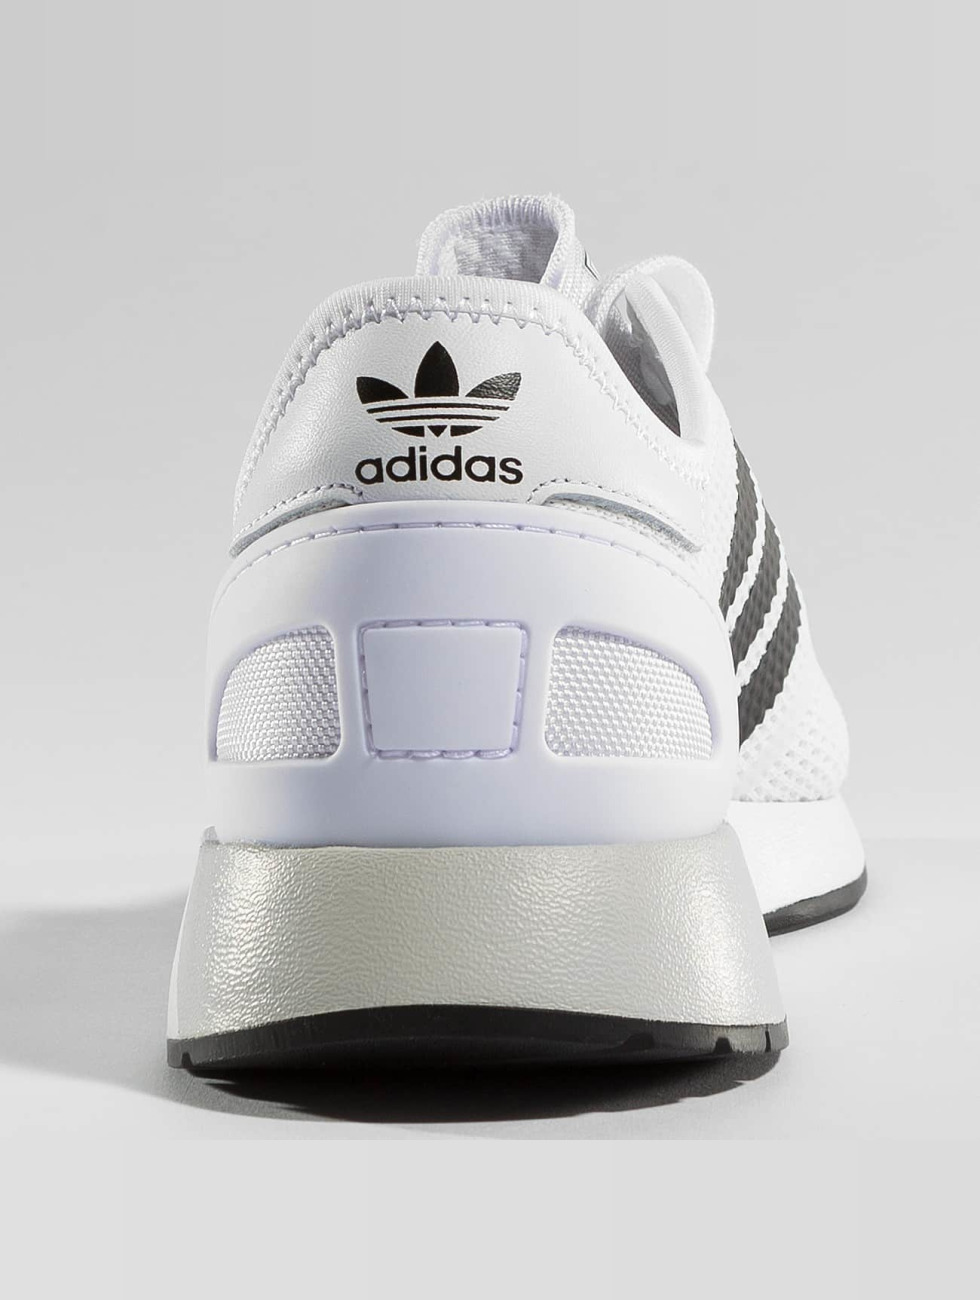 Adidas Originaler Schoen / Sneaker N-5923 Runner Cls I Wit 397876 Manchester Ny 7Q8FFAK